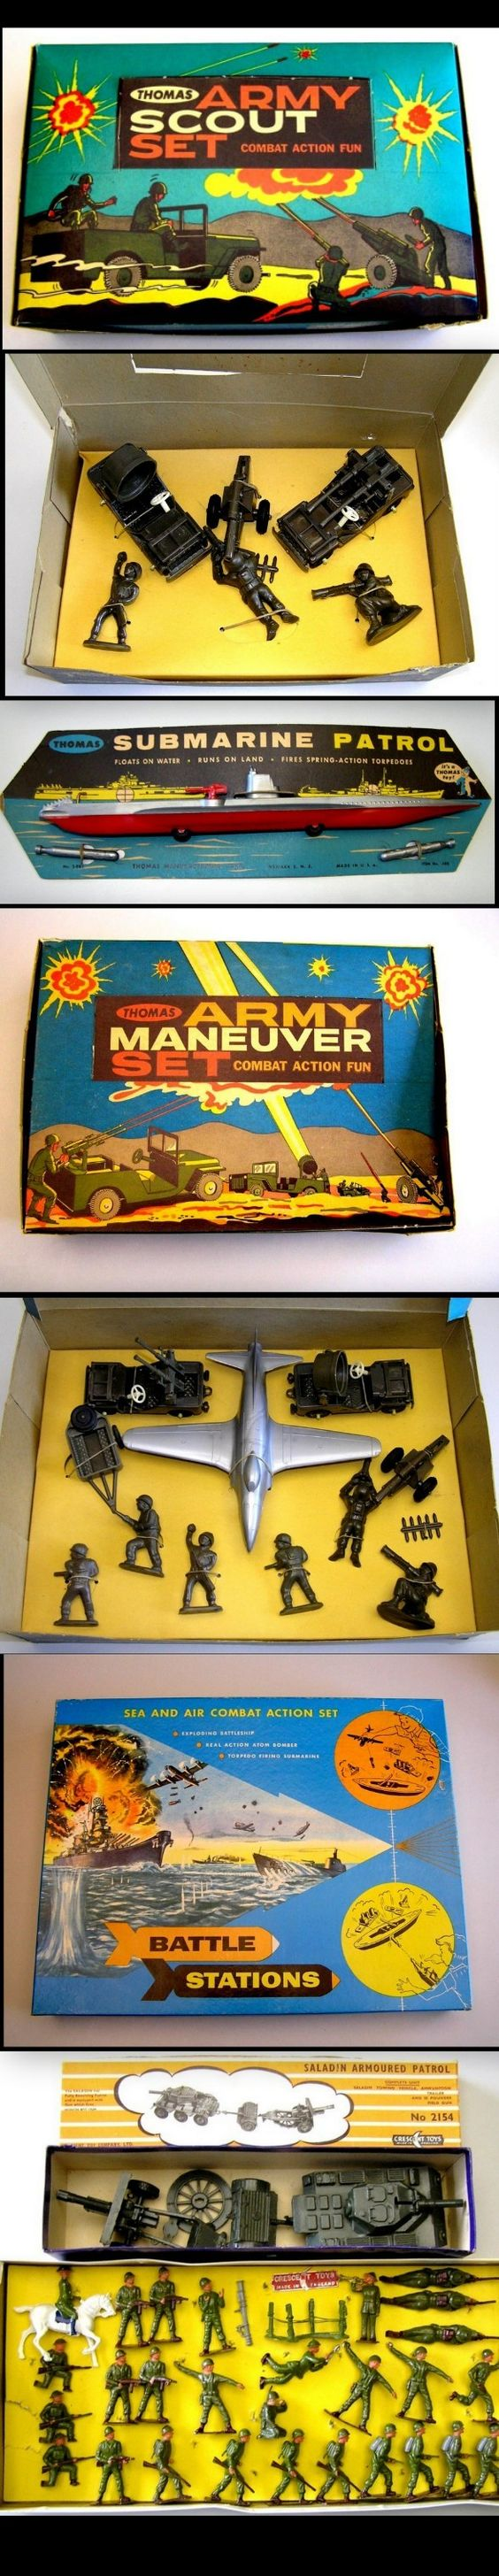 Antique Military Toys 60